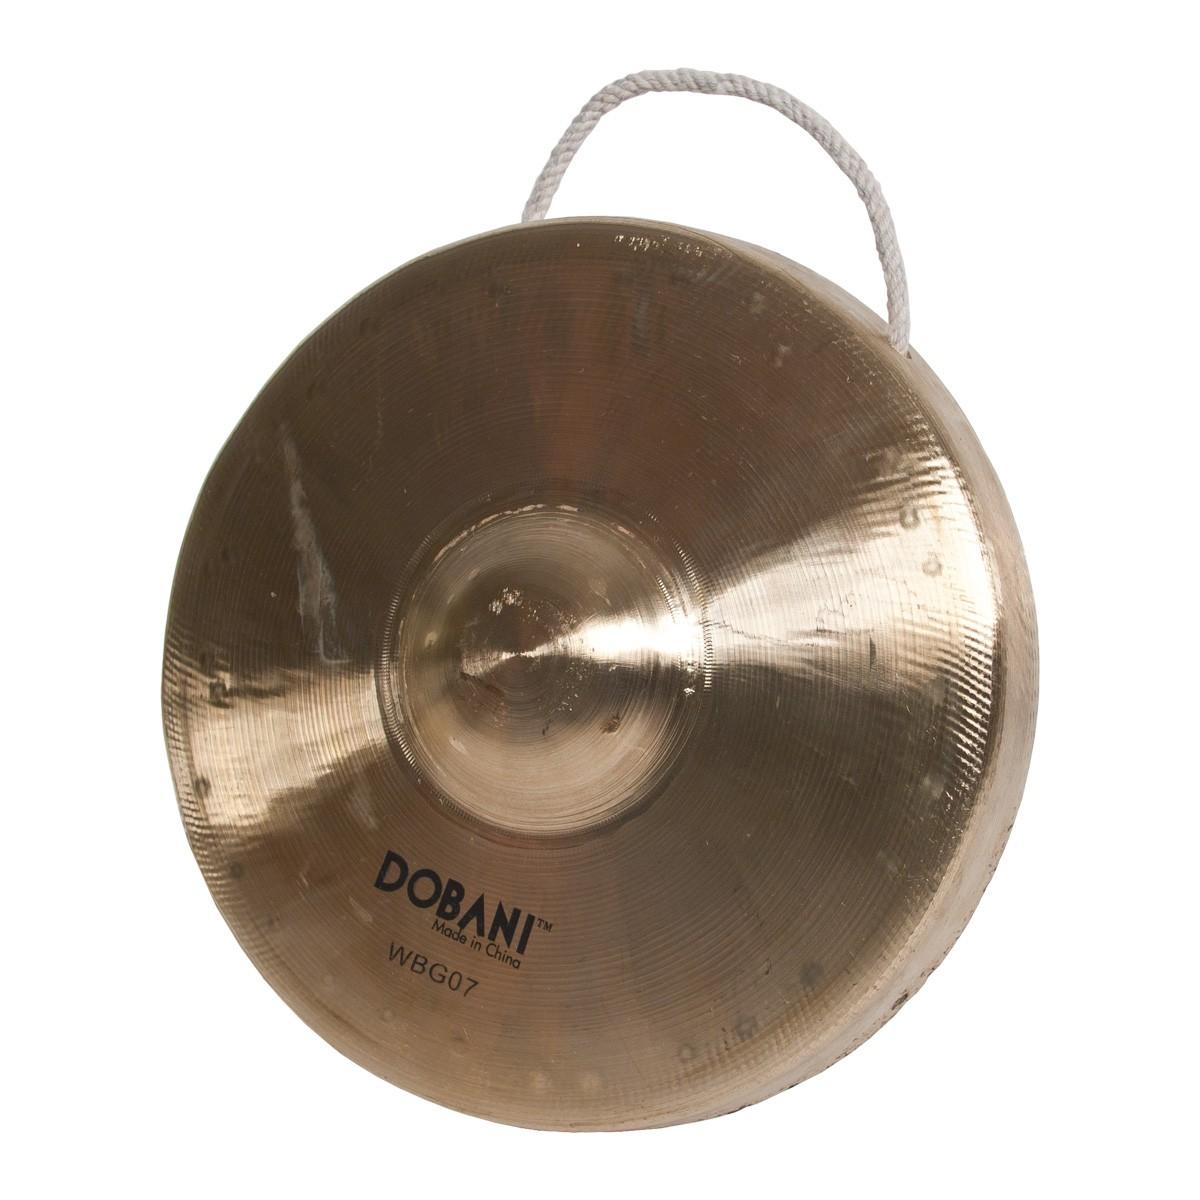 DOBANI Bao Gong  7' (18cm) w/ Beater